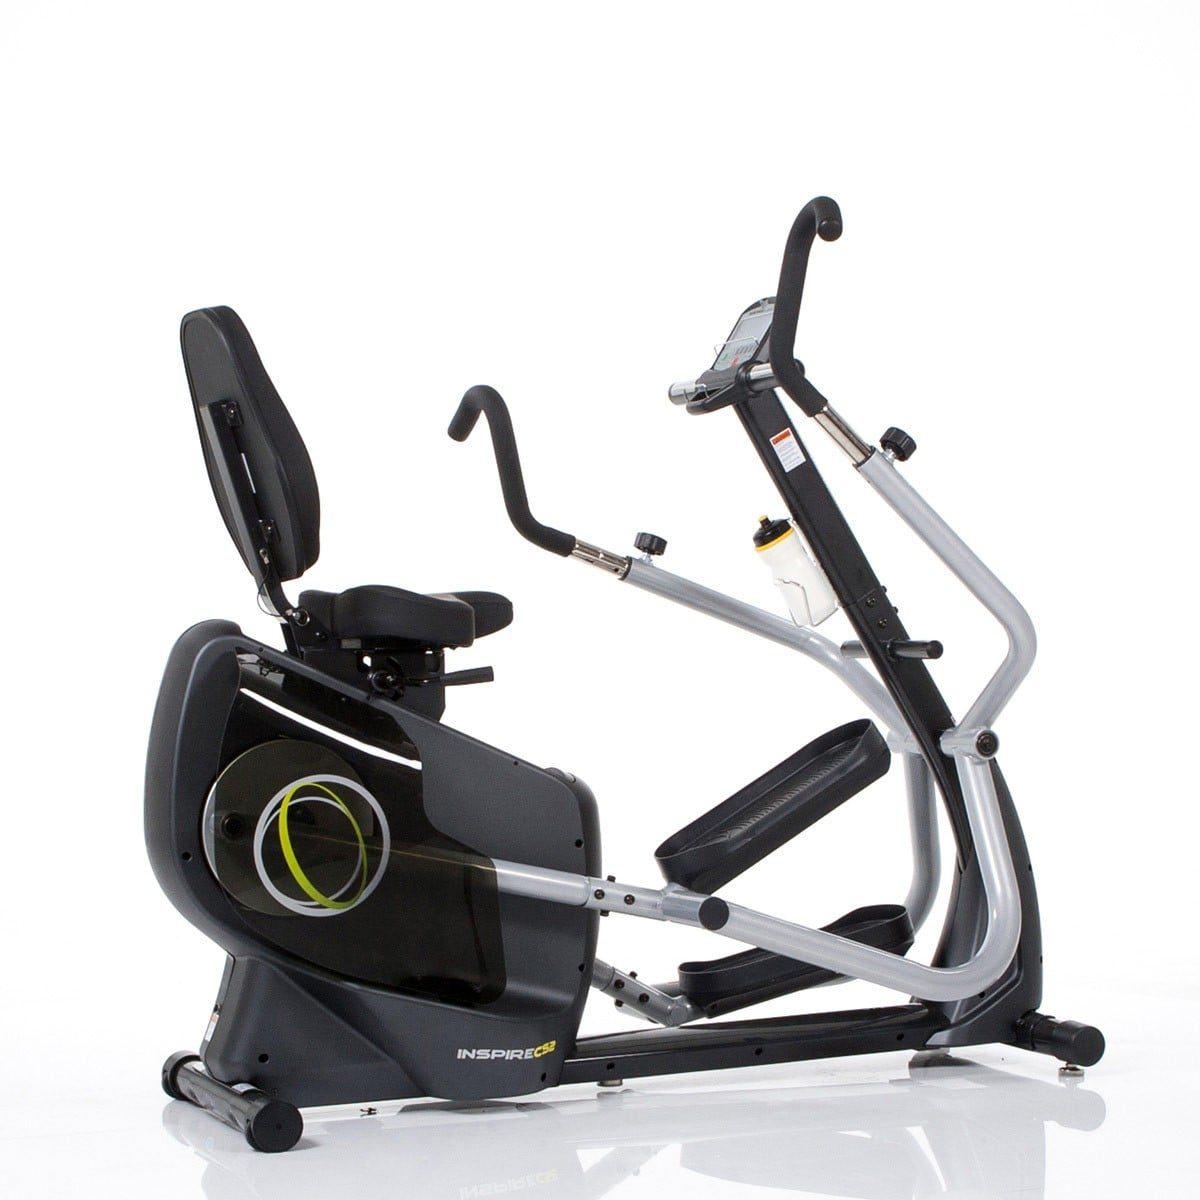 Гибридный тренажер Finnlo Maximum/Inspire Cardio Strider CS2